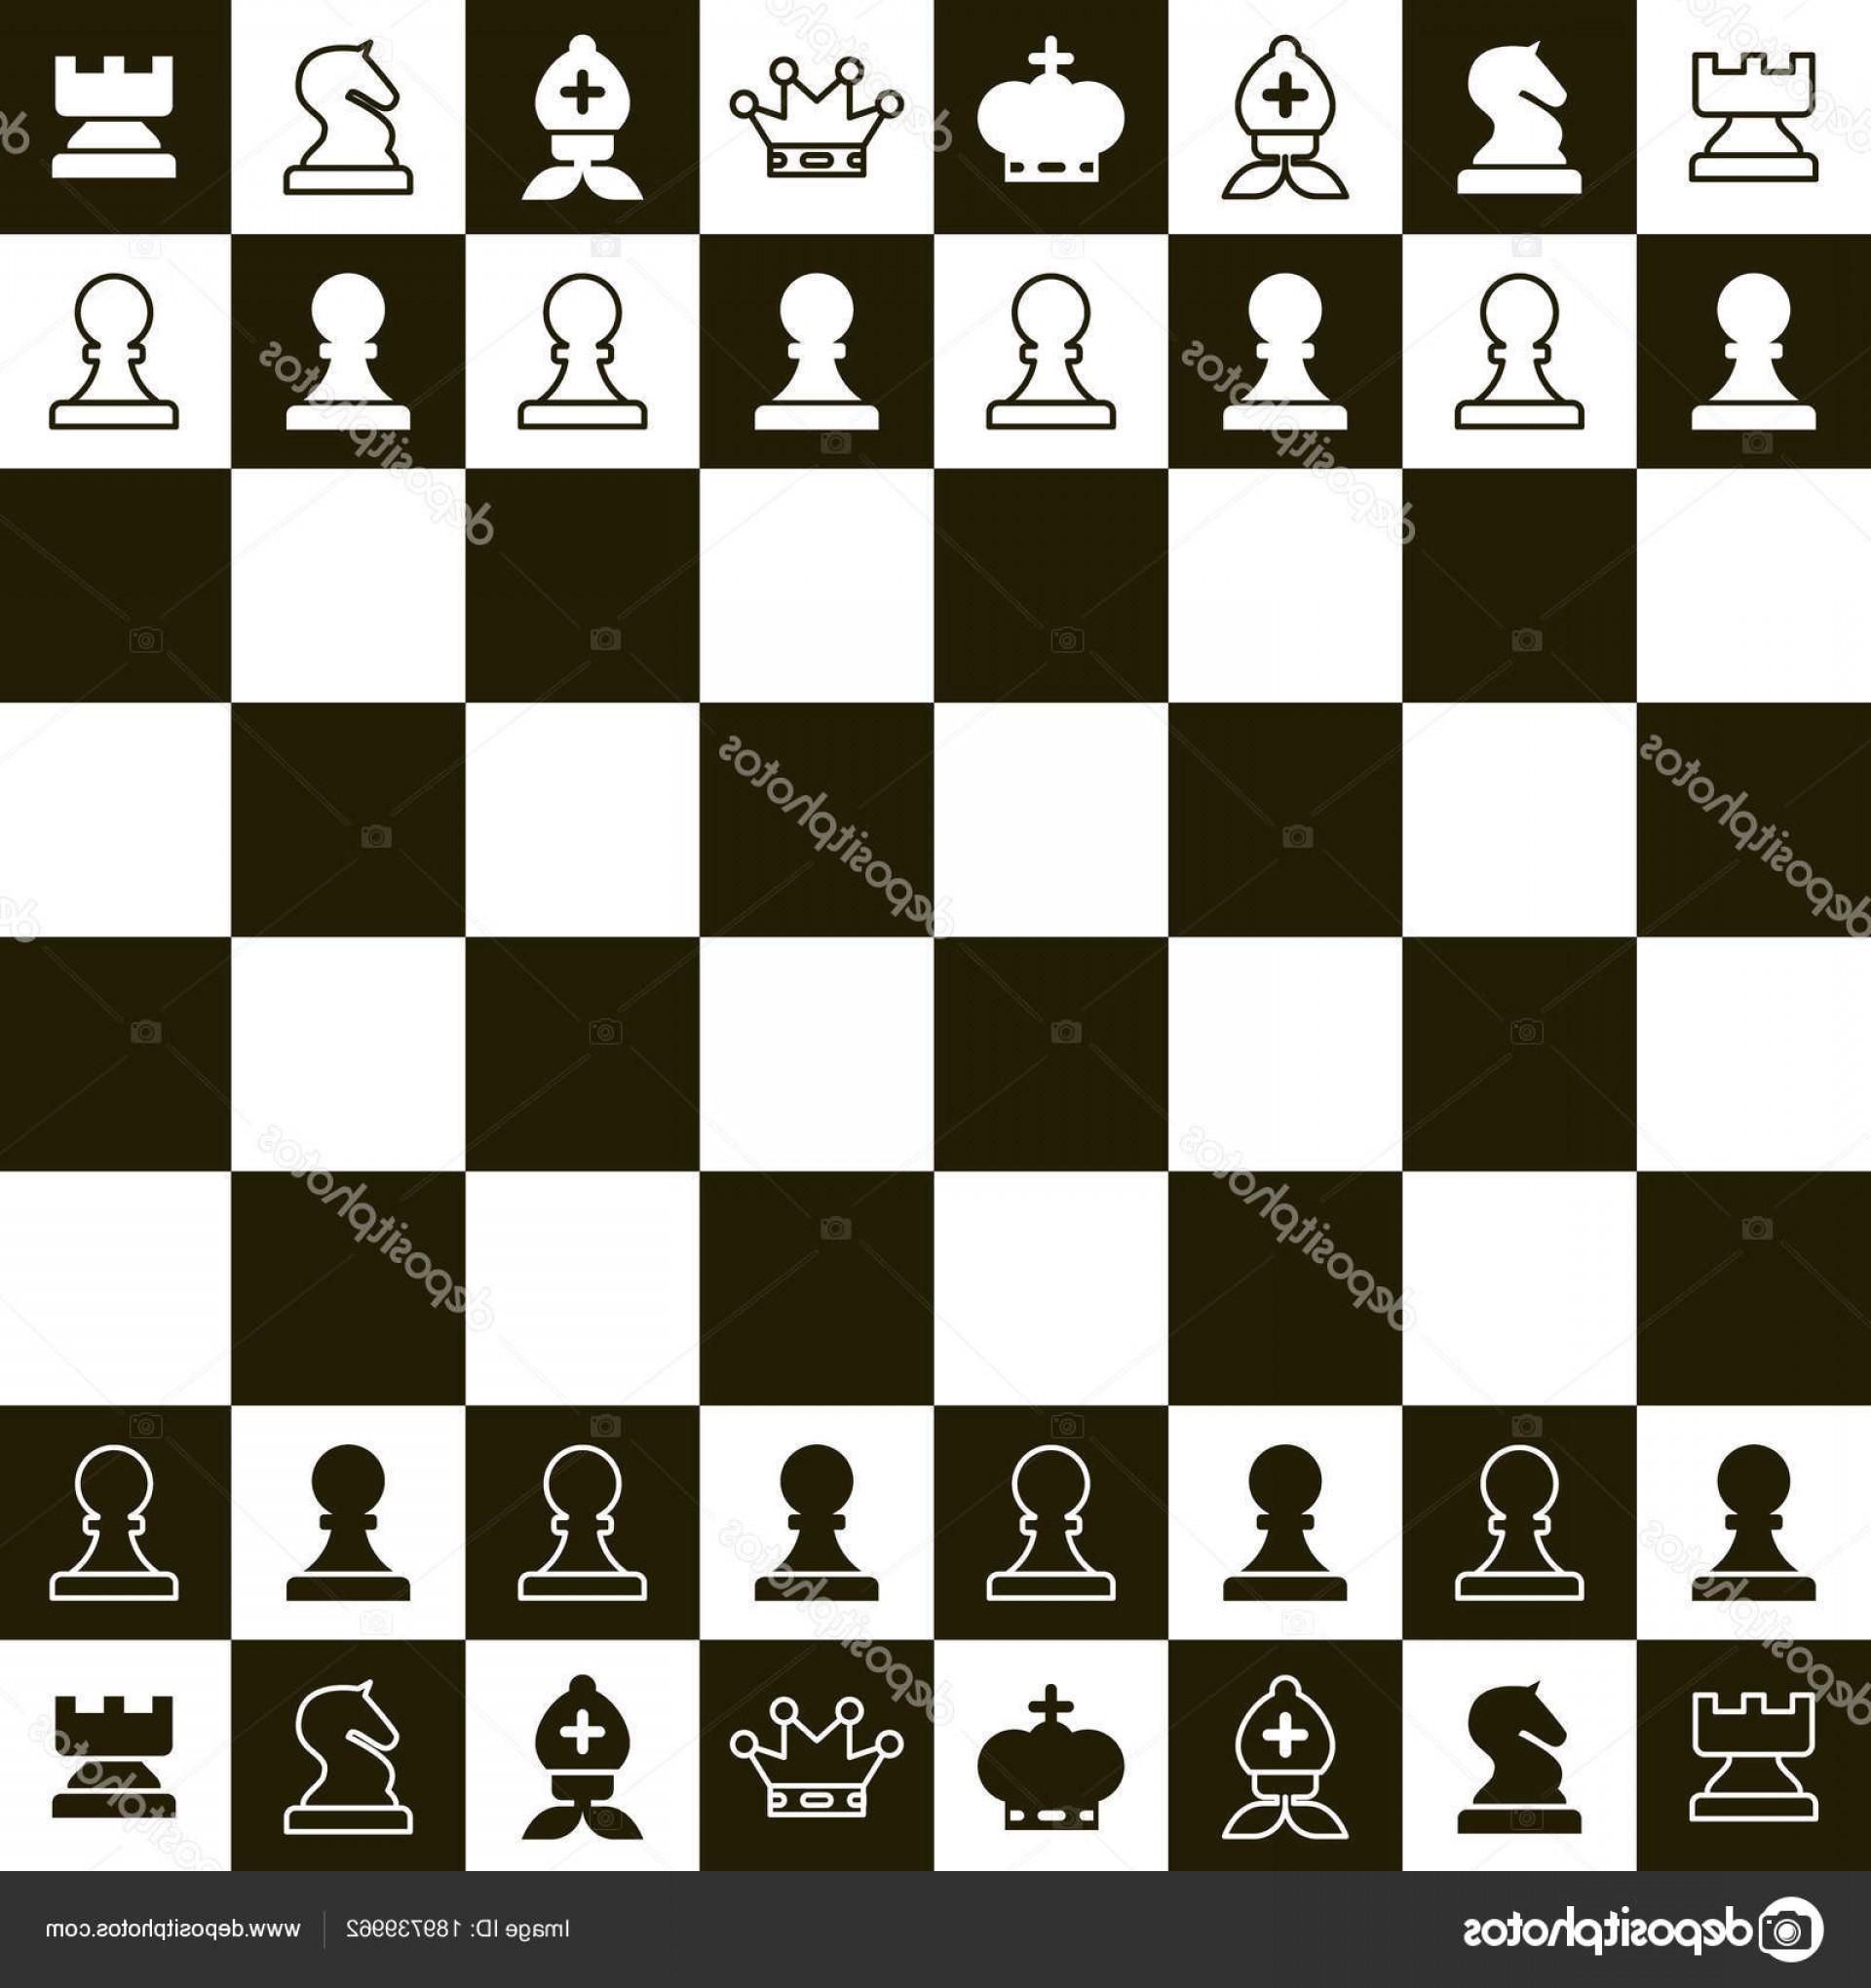 1920x2040 Stock Illustration Chess Board Vector Top View Lazttweet